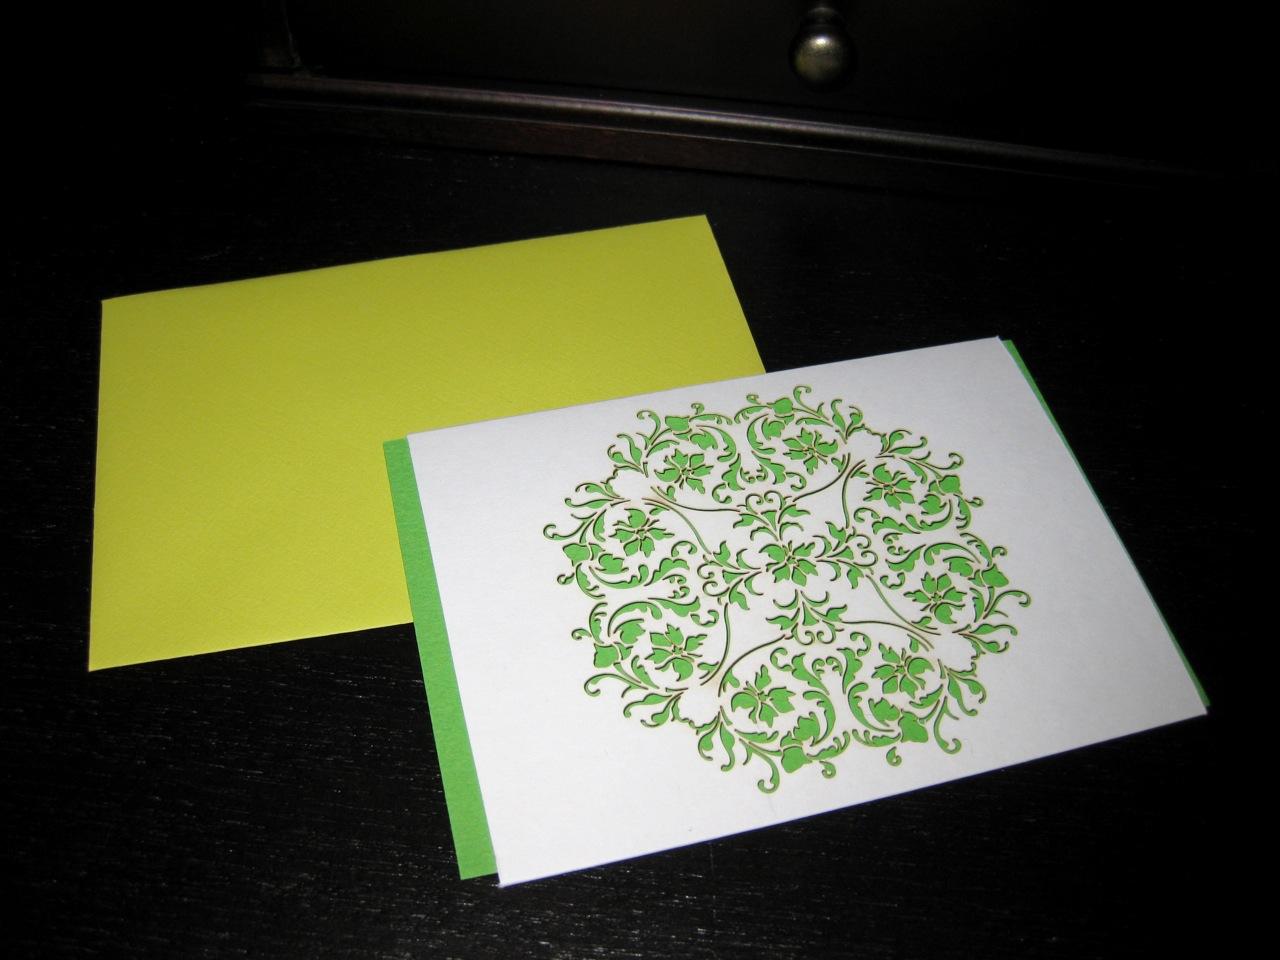 laser cut card by Charlyn Koo